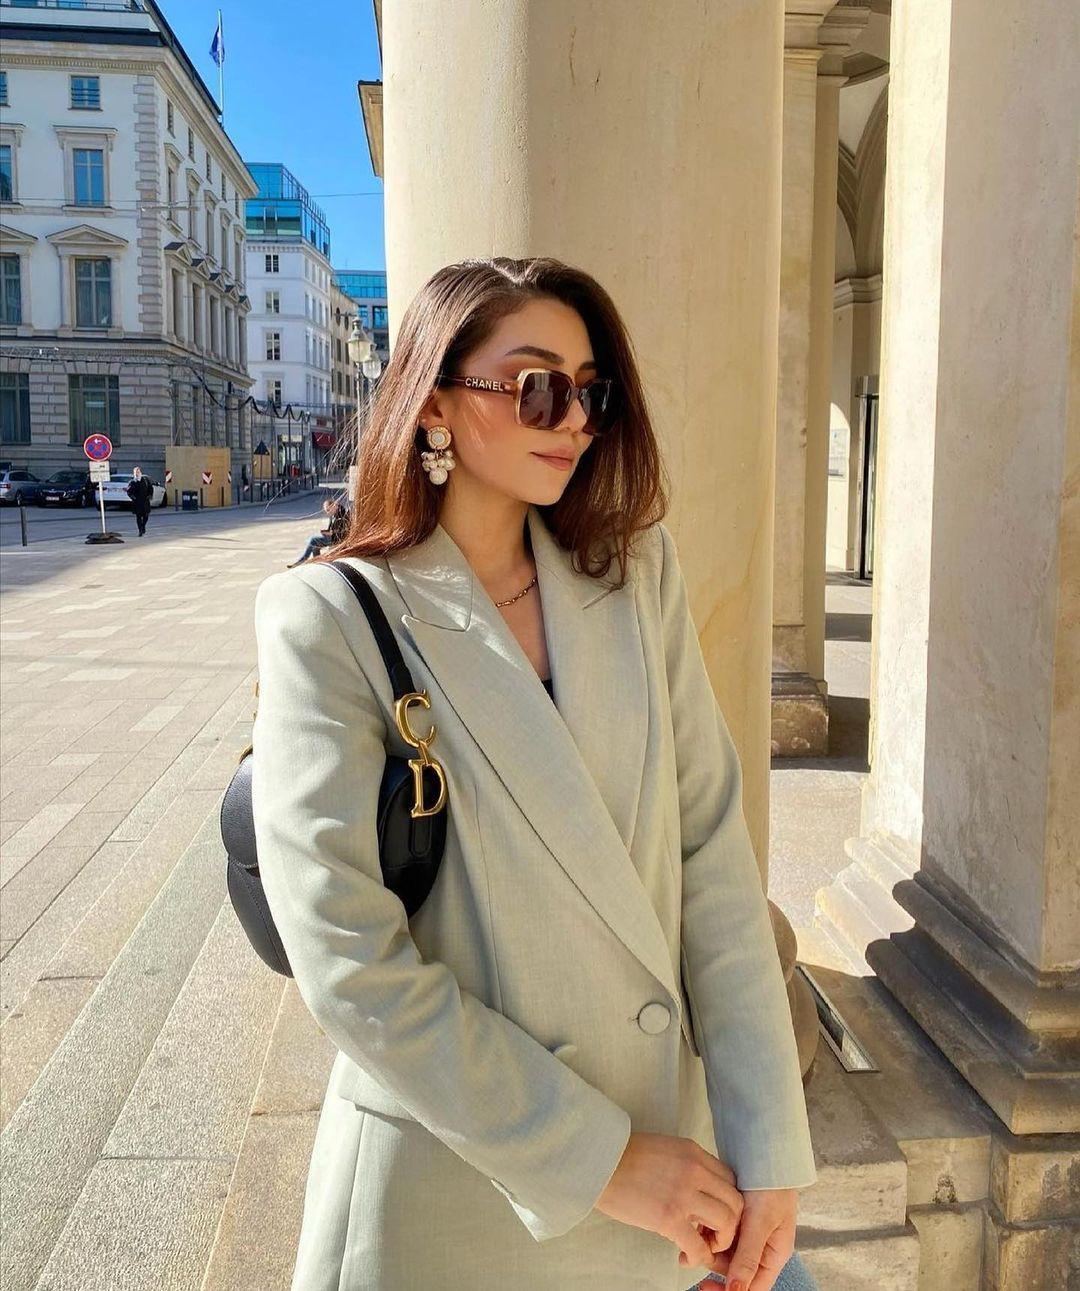 crossover breasted bent blazer de Zara sur zara.outfits